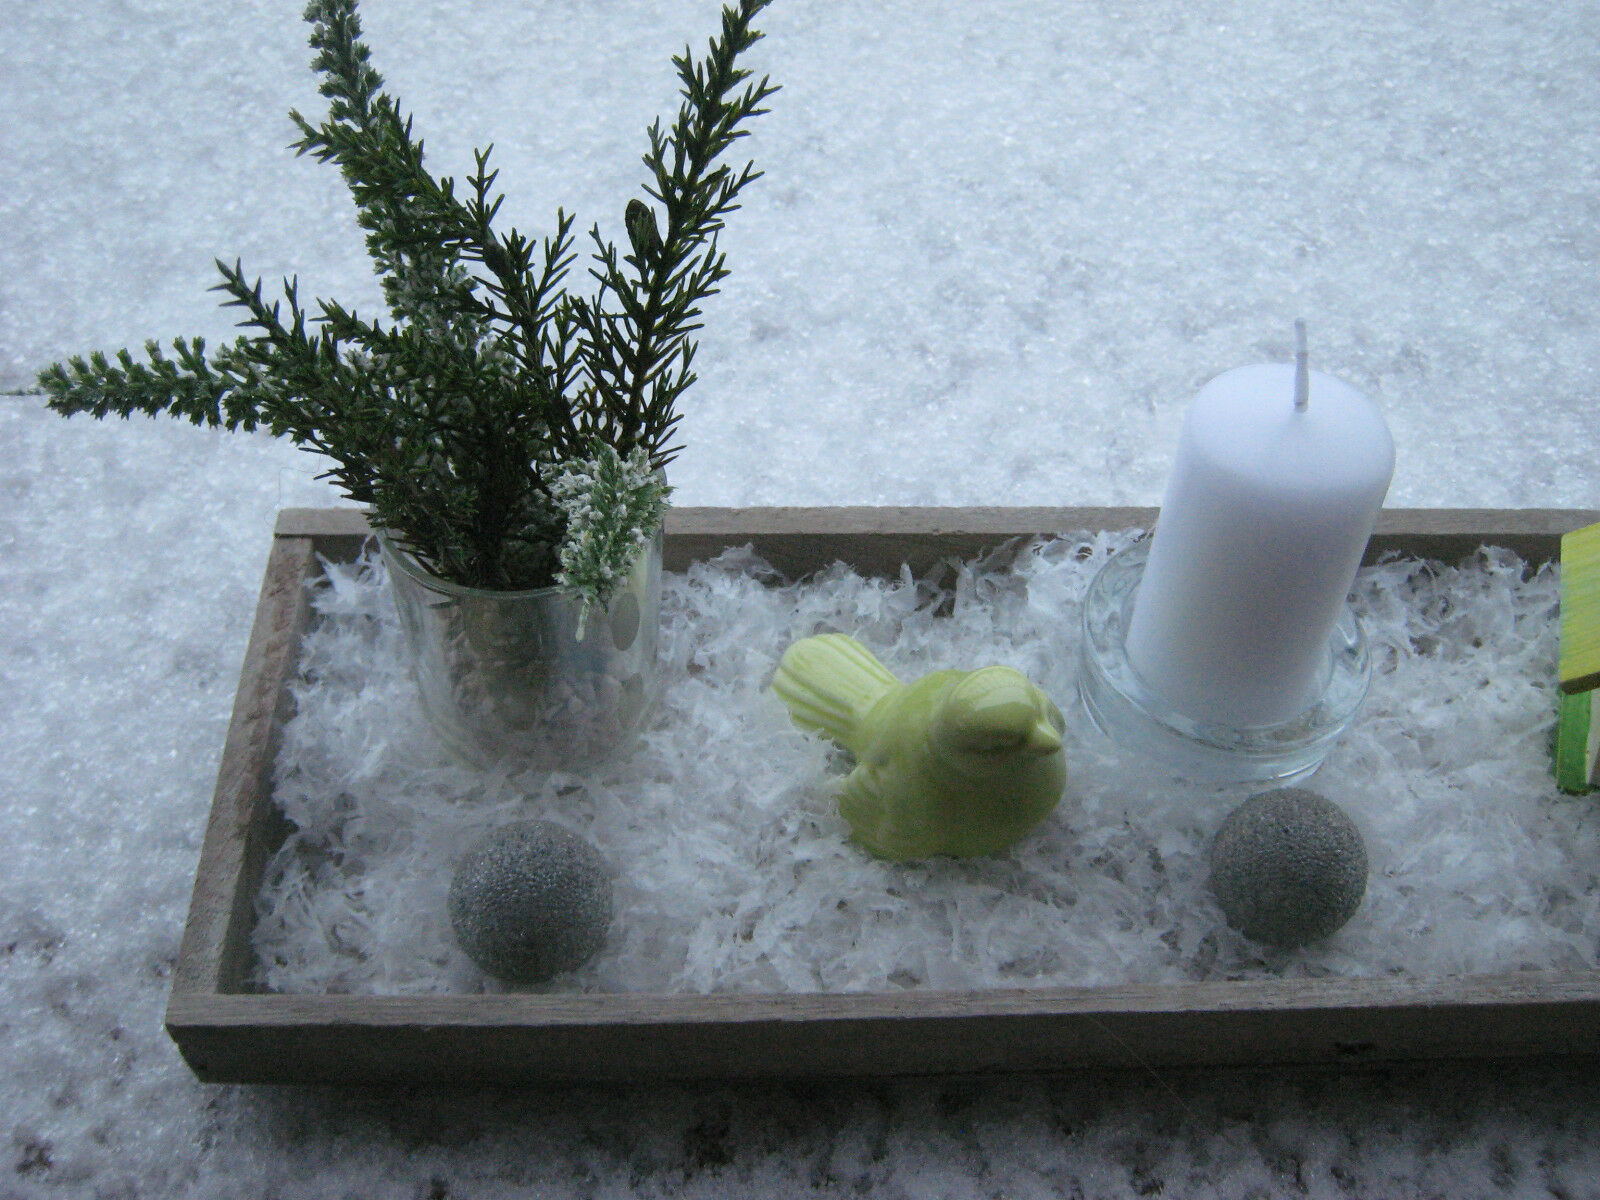 winter deko schnee dekoschale holzschale mit kerzen tablett holz wei tischdeko eur 17 00. Black Bedroom Furniture Sets. Home Design Ideas